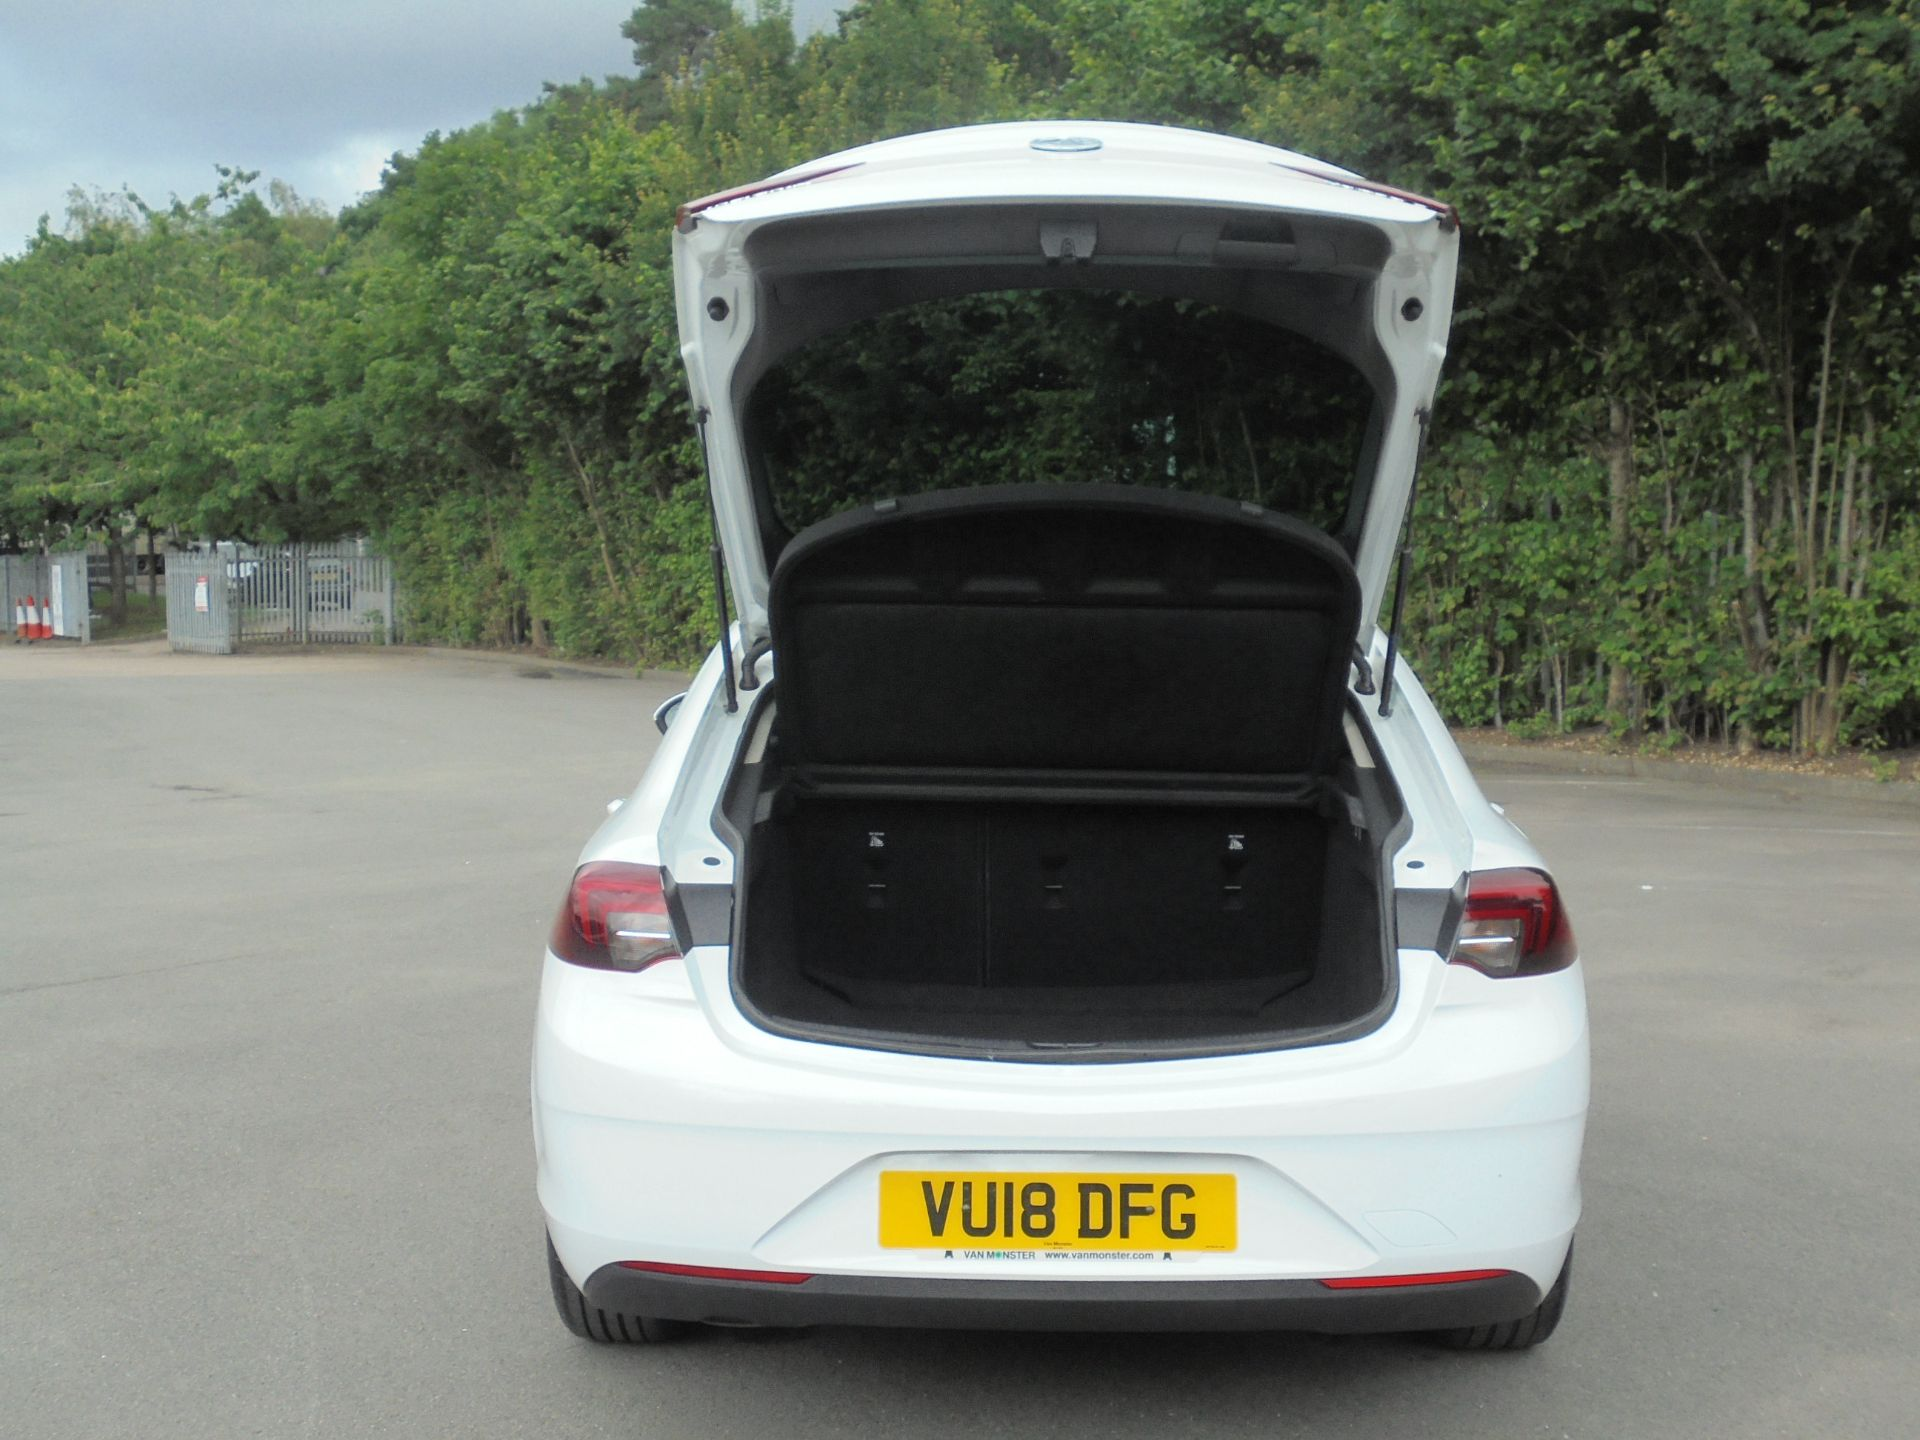 2018 Vauxhall Insignia 1.6 Grand Sport Turbo D Ecotec [136] Sri Nav 5Dr (VU18DFG) Image 9